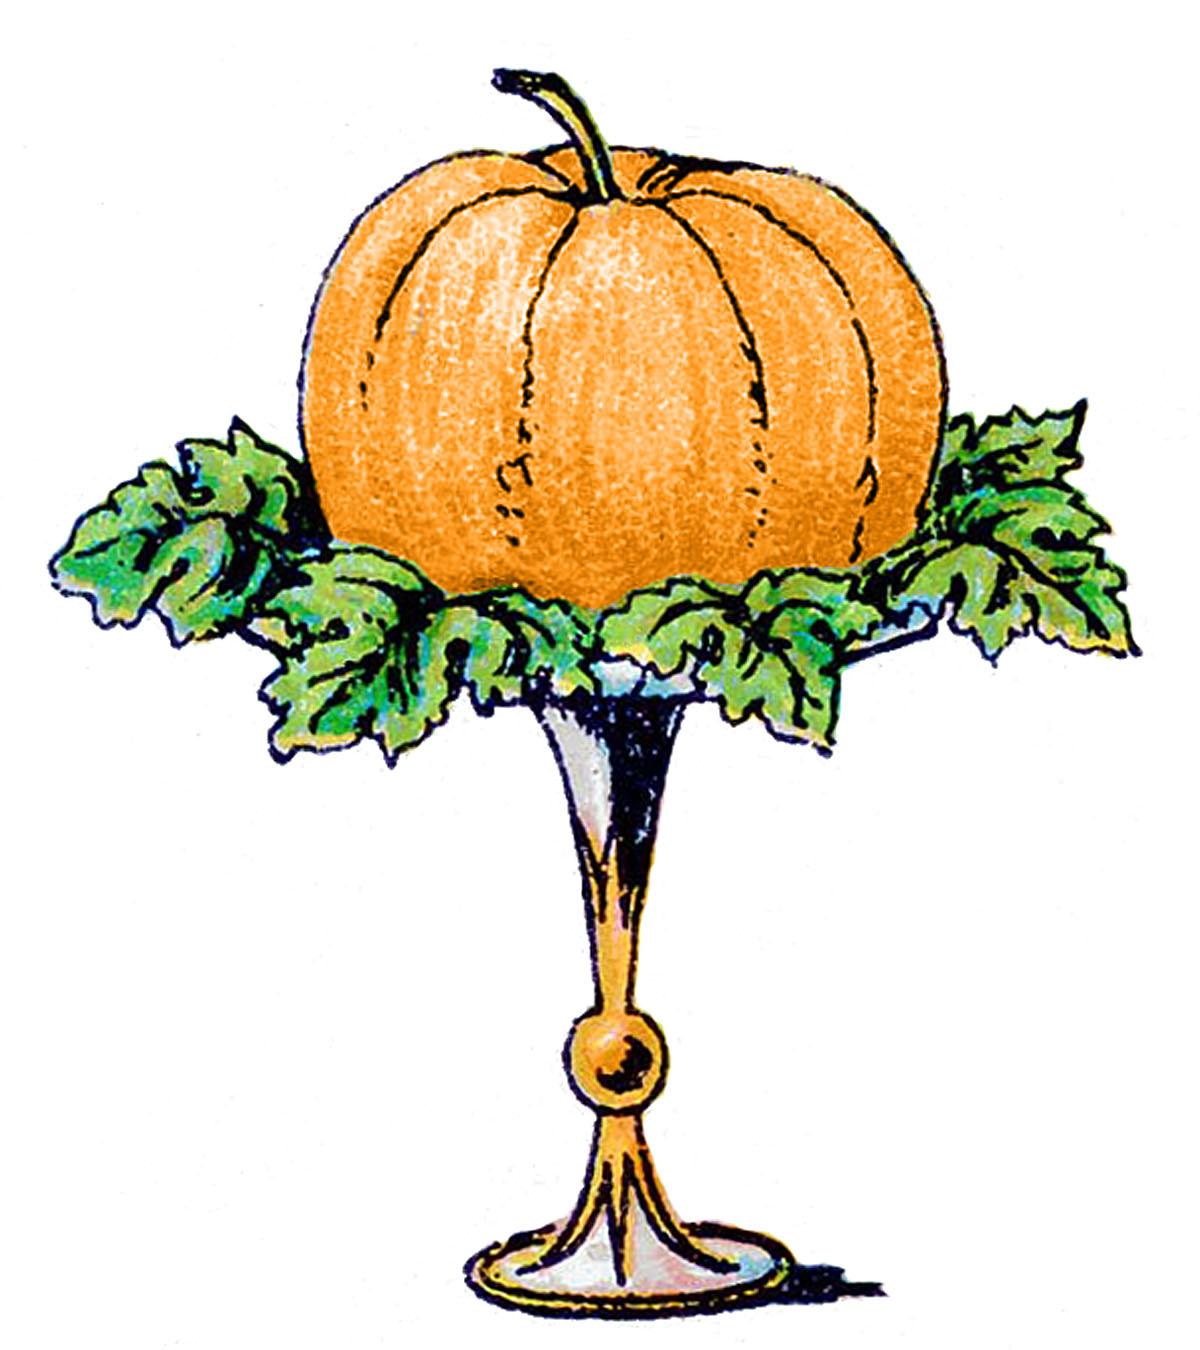 Vintage Clip Art - Pumpkin on a Pedestal - The Graphics Fairy